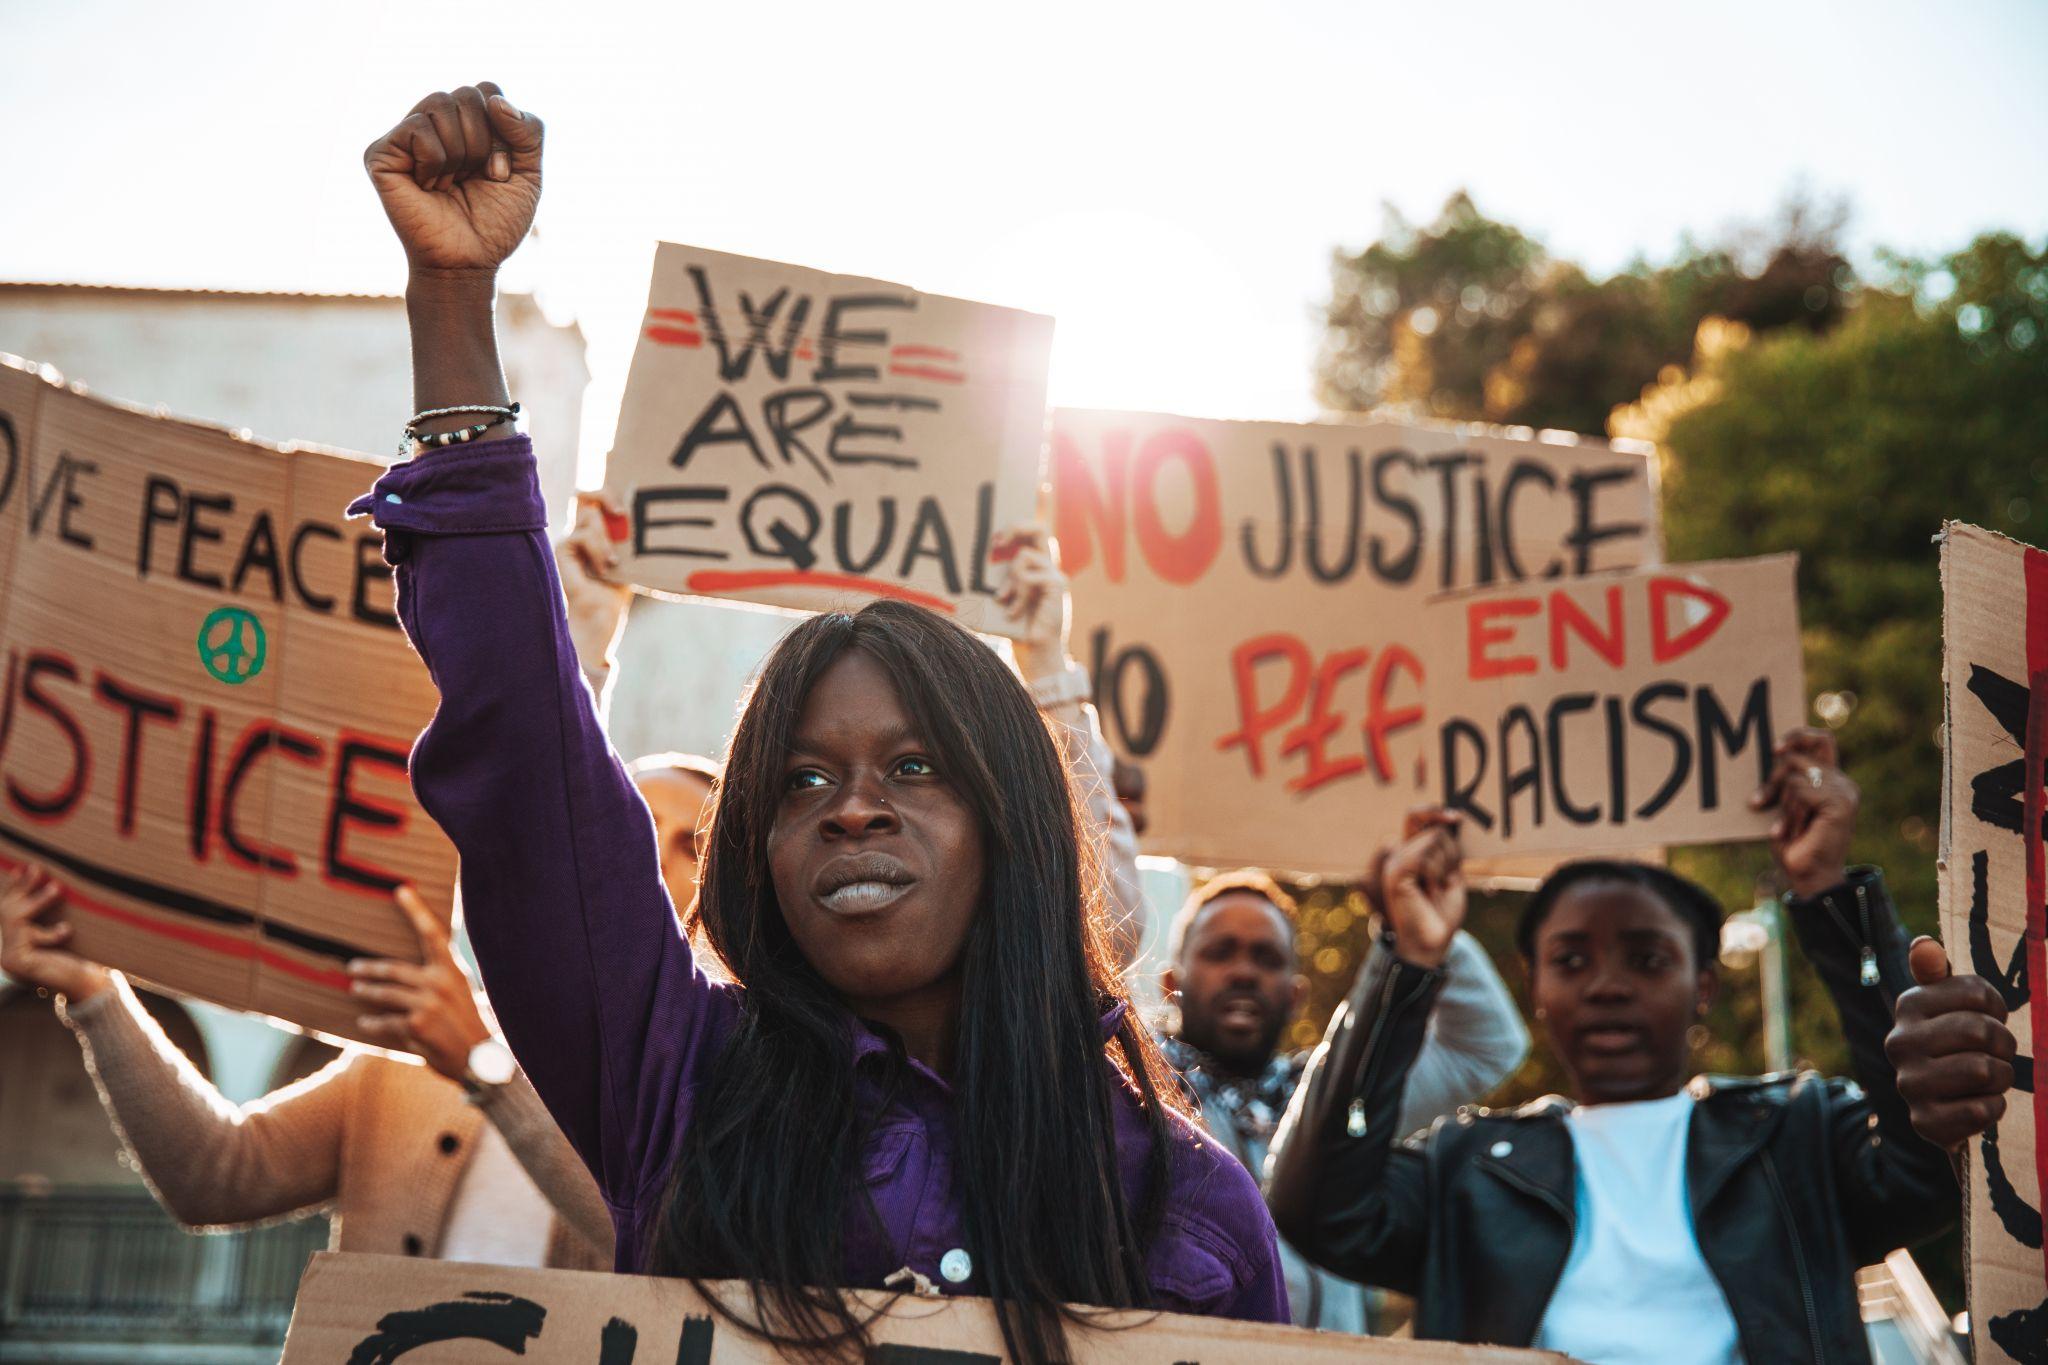 Dear Texas teachers, it's really not that hard to avoid being racist